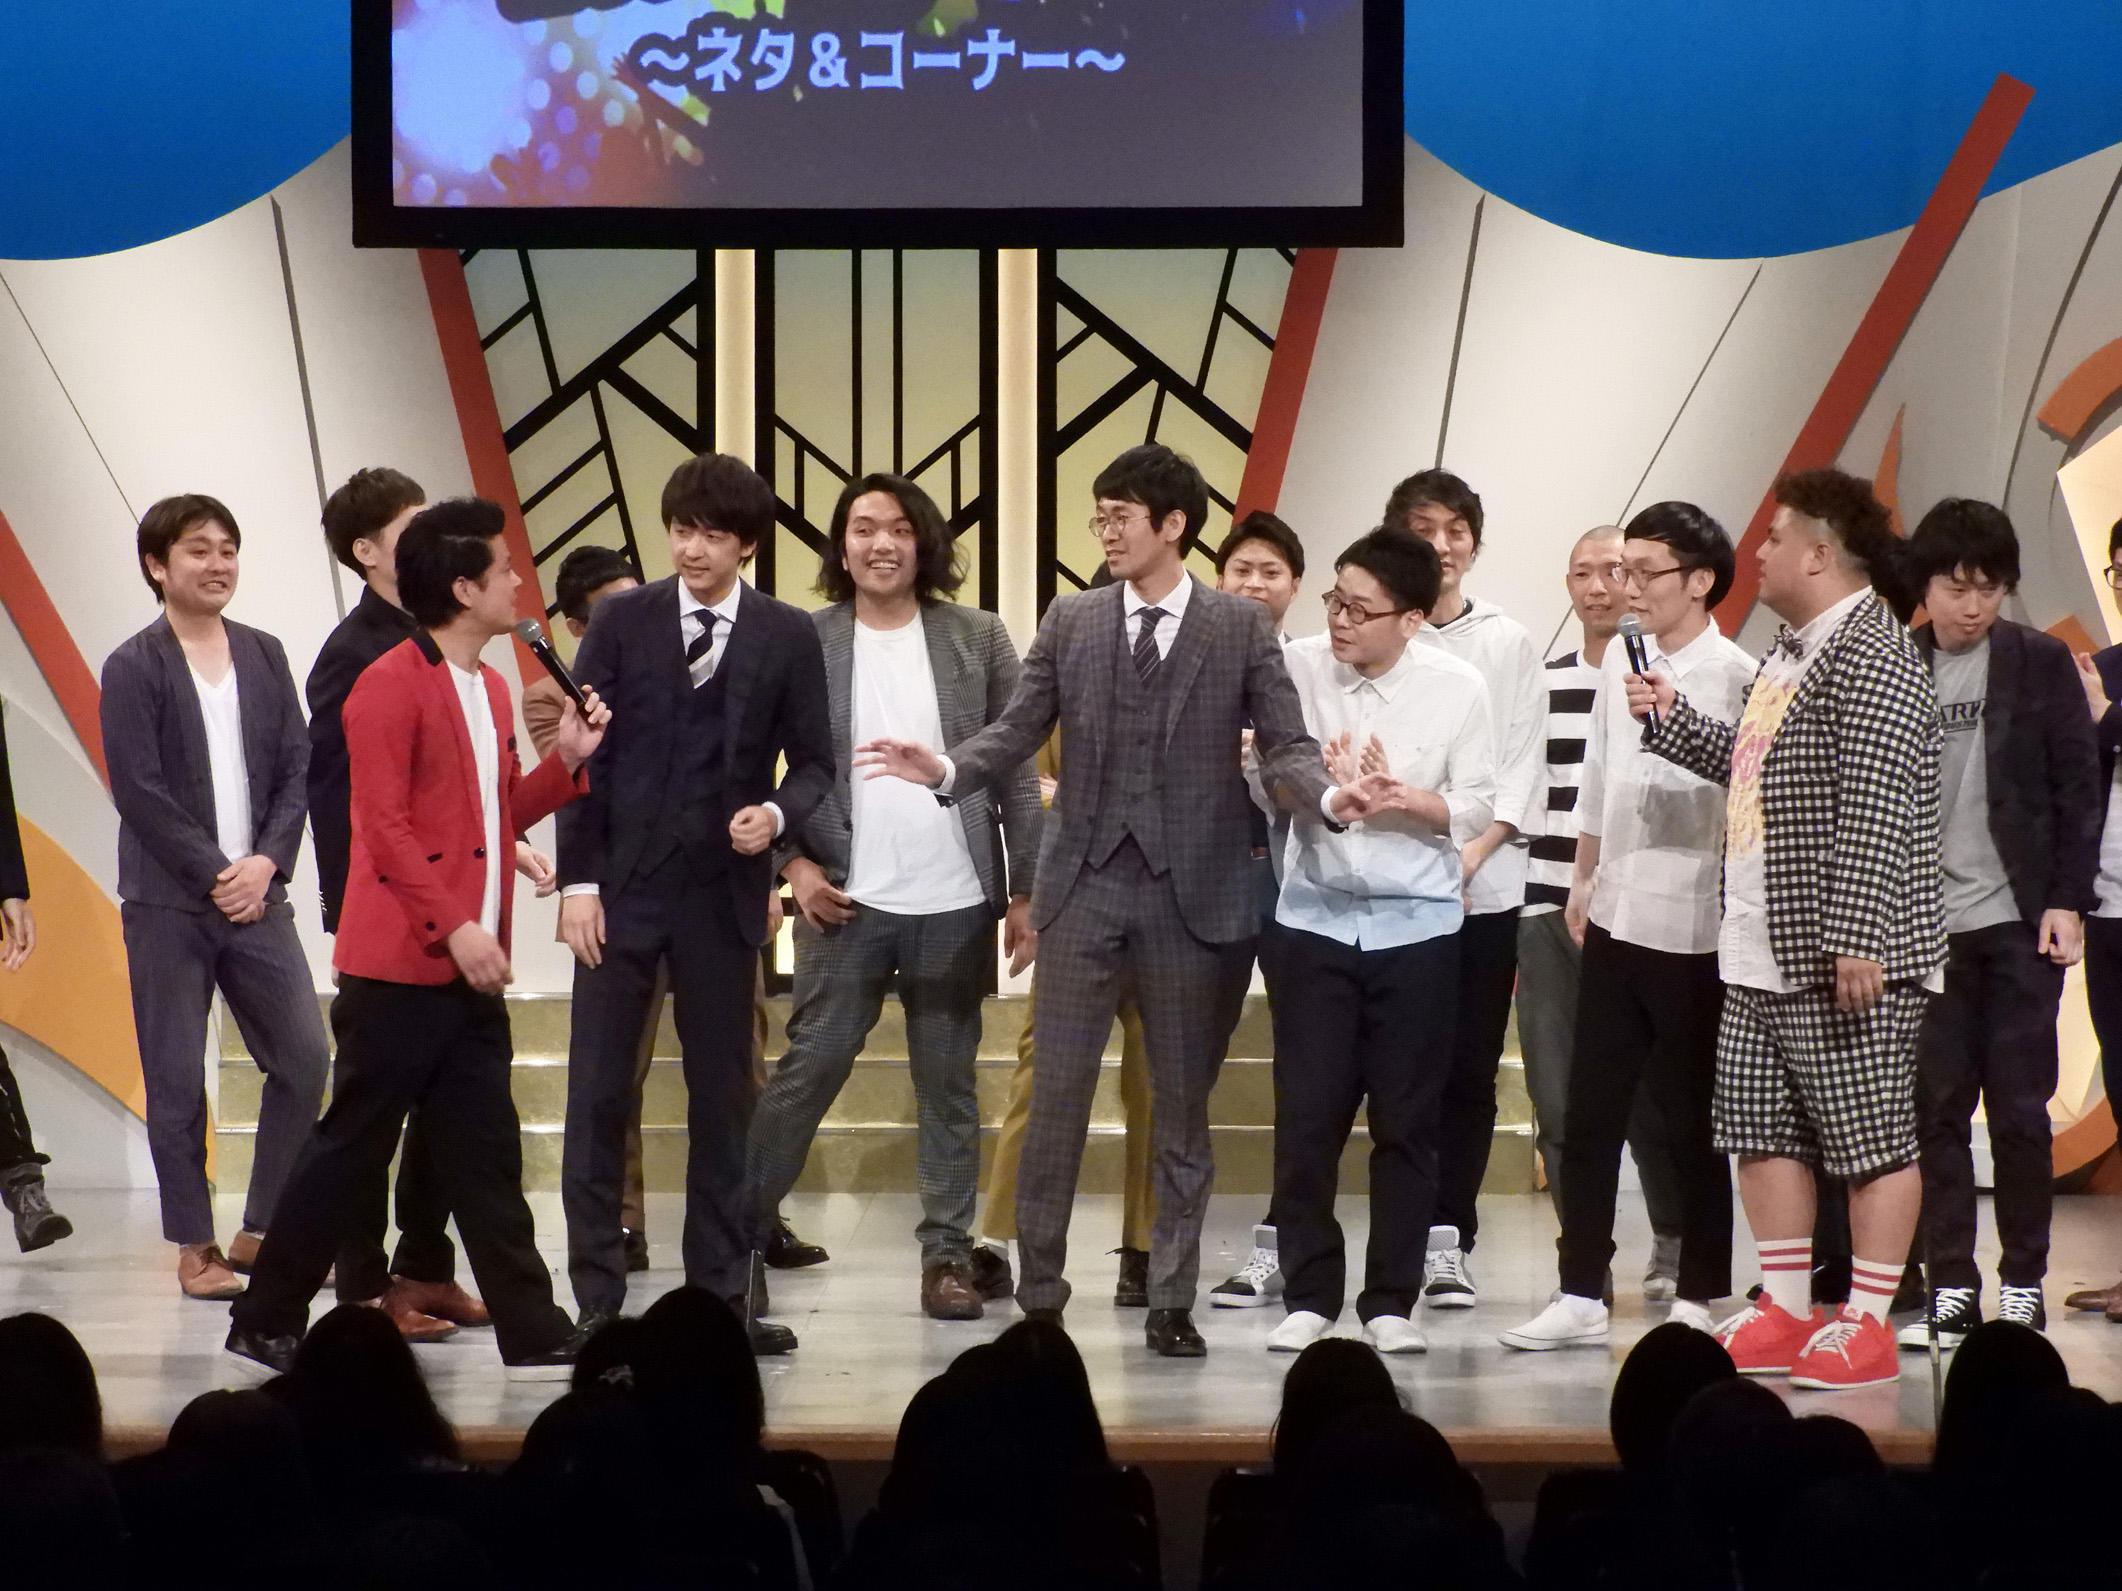 http://news.yoshimoto.co.jp/20180528121148-bfdea382c49462036bba45fe4a0cbb58f5c71052.jpg